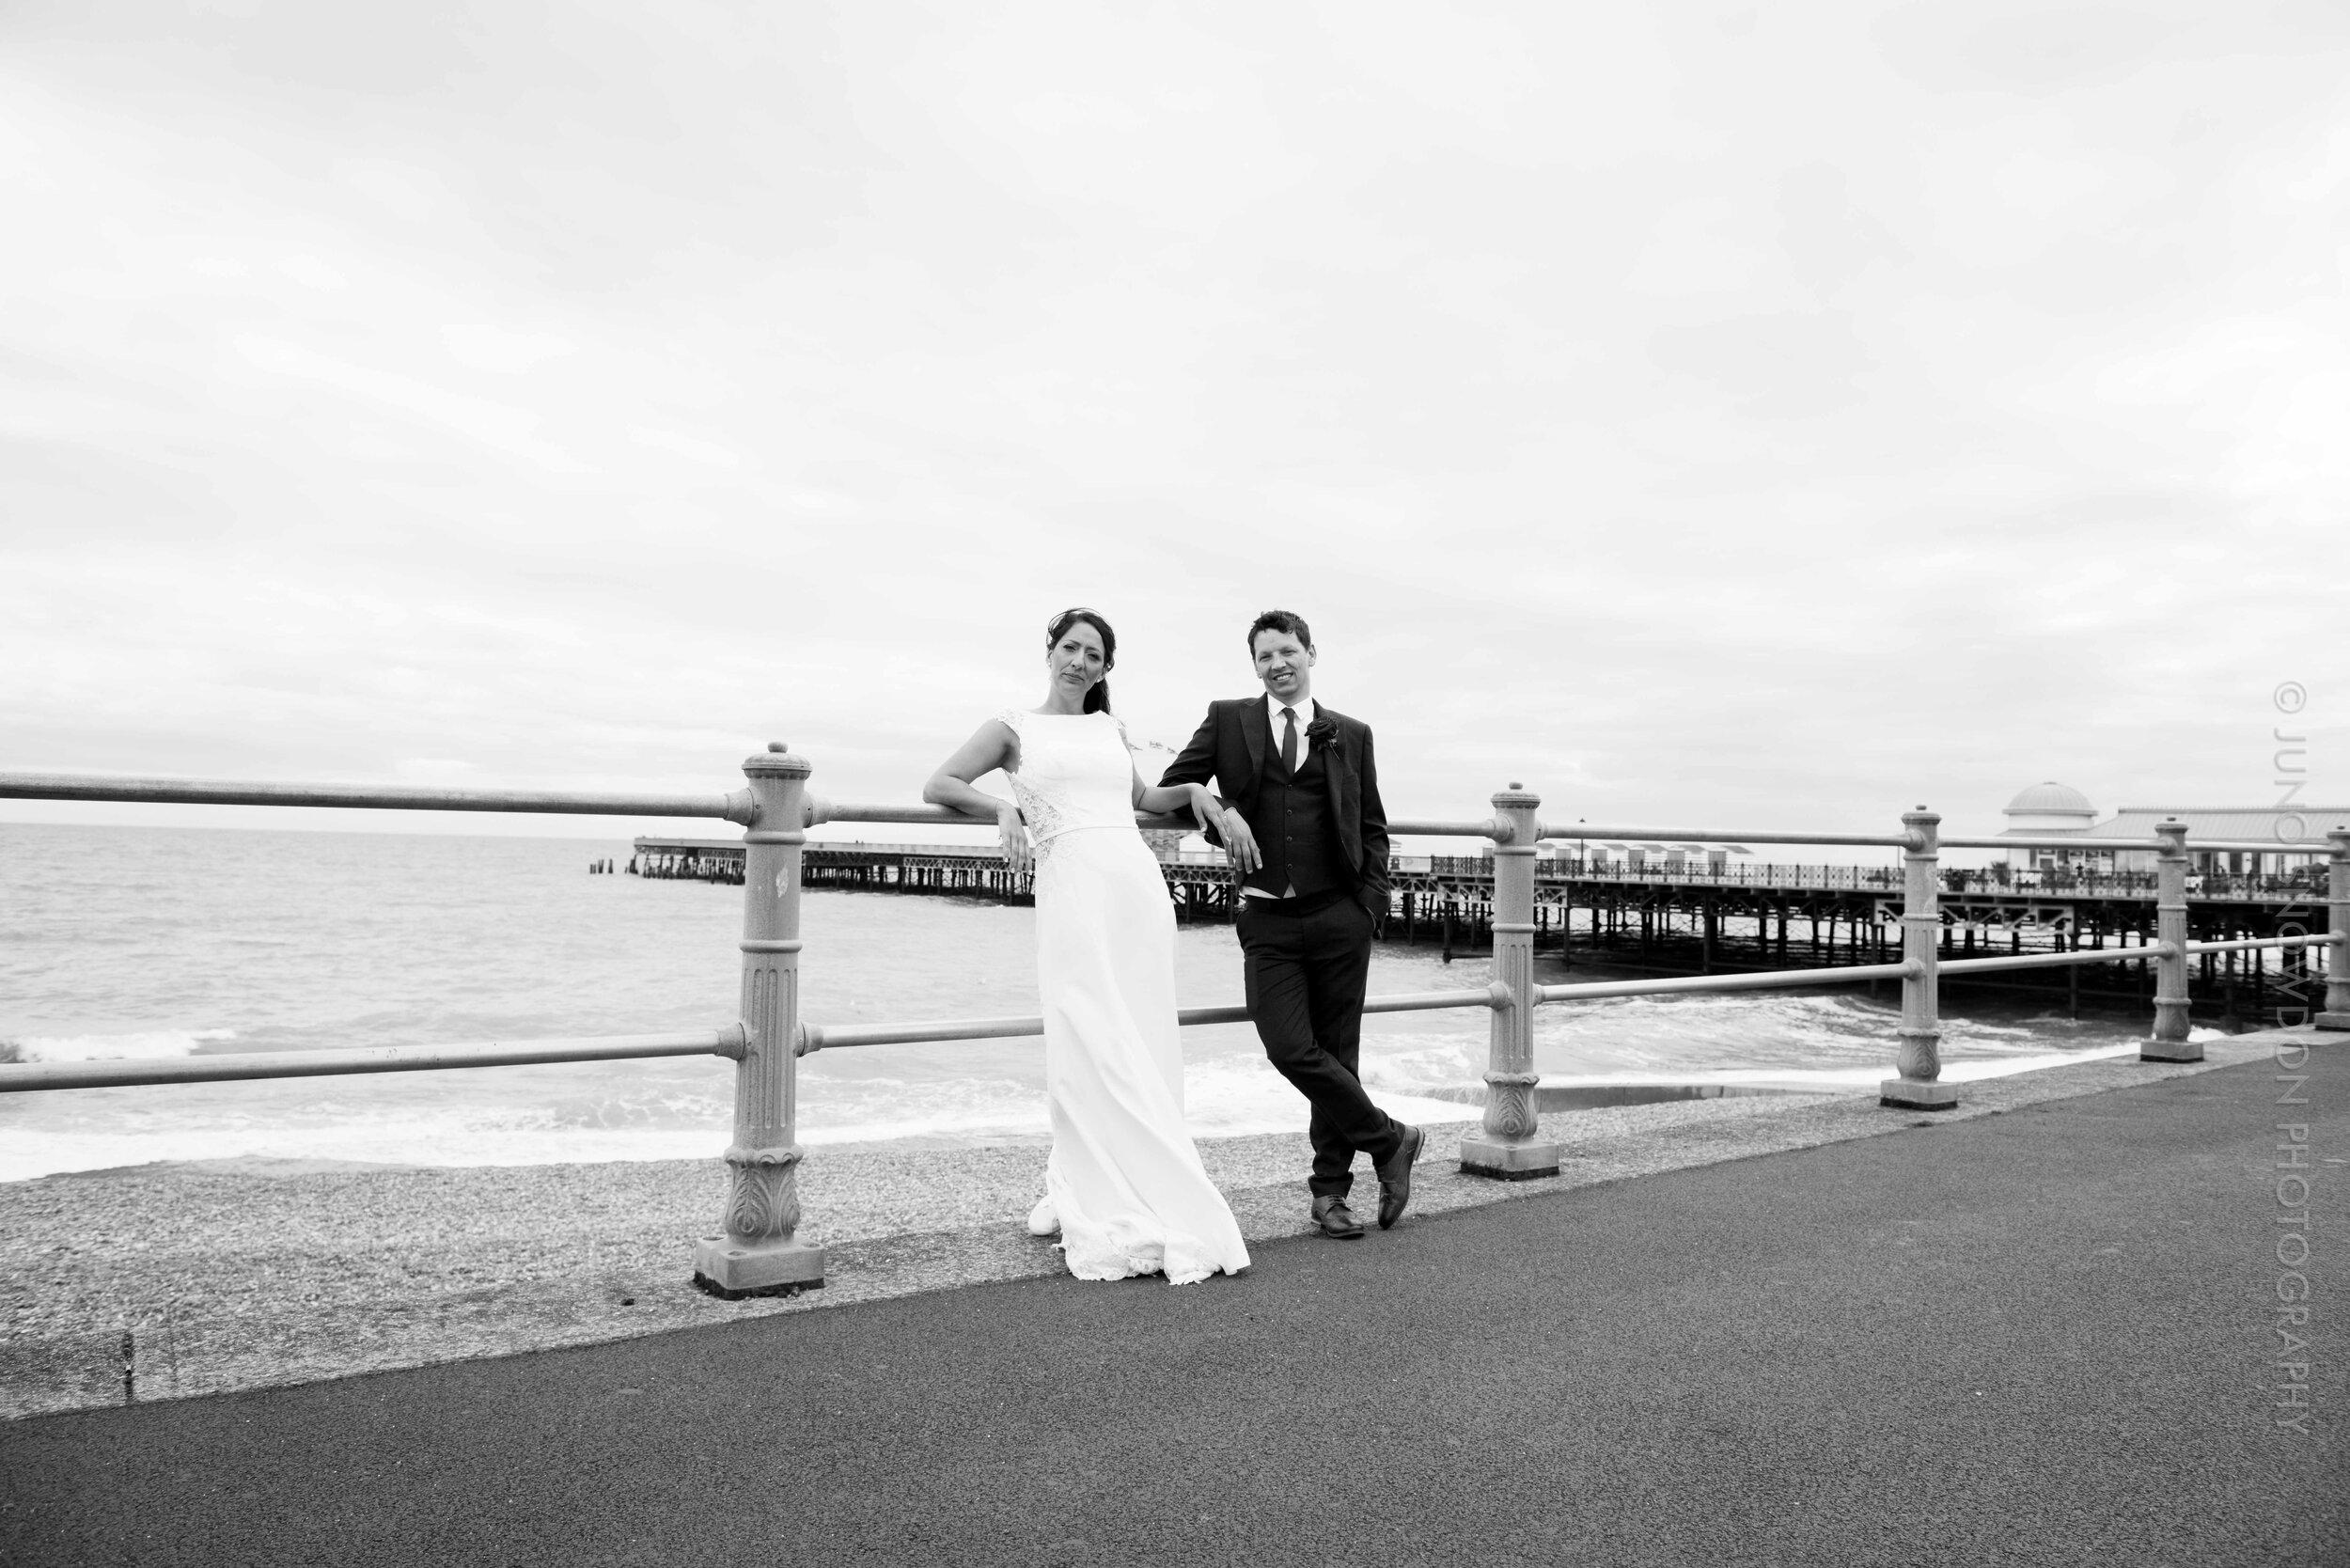 juno-snowdon-photography-wedding-7714.jpg